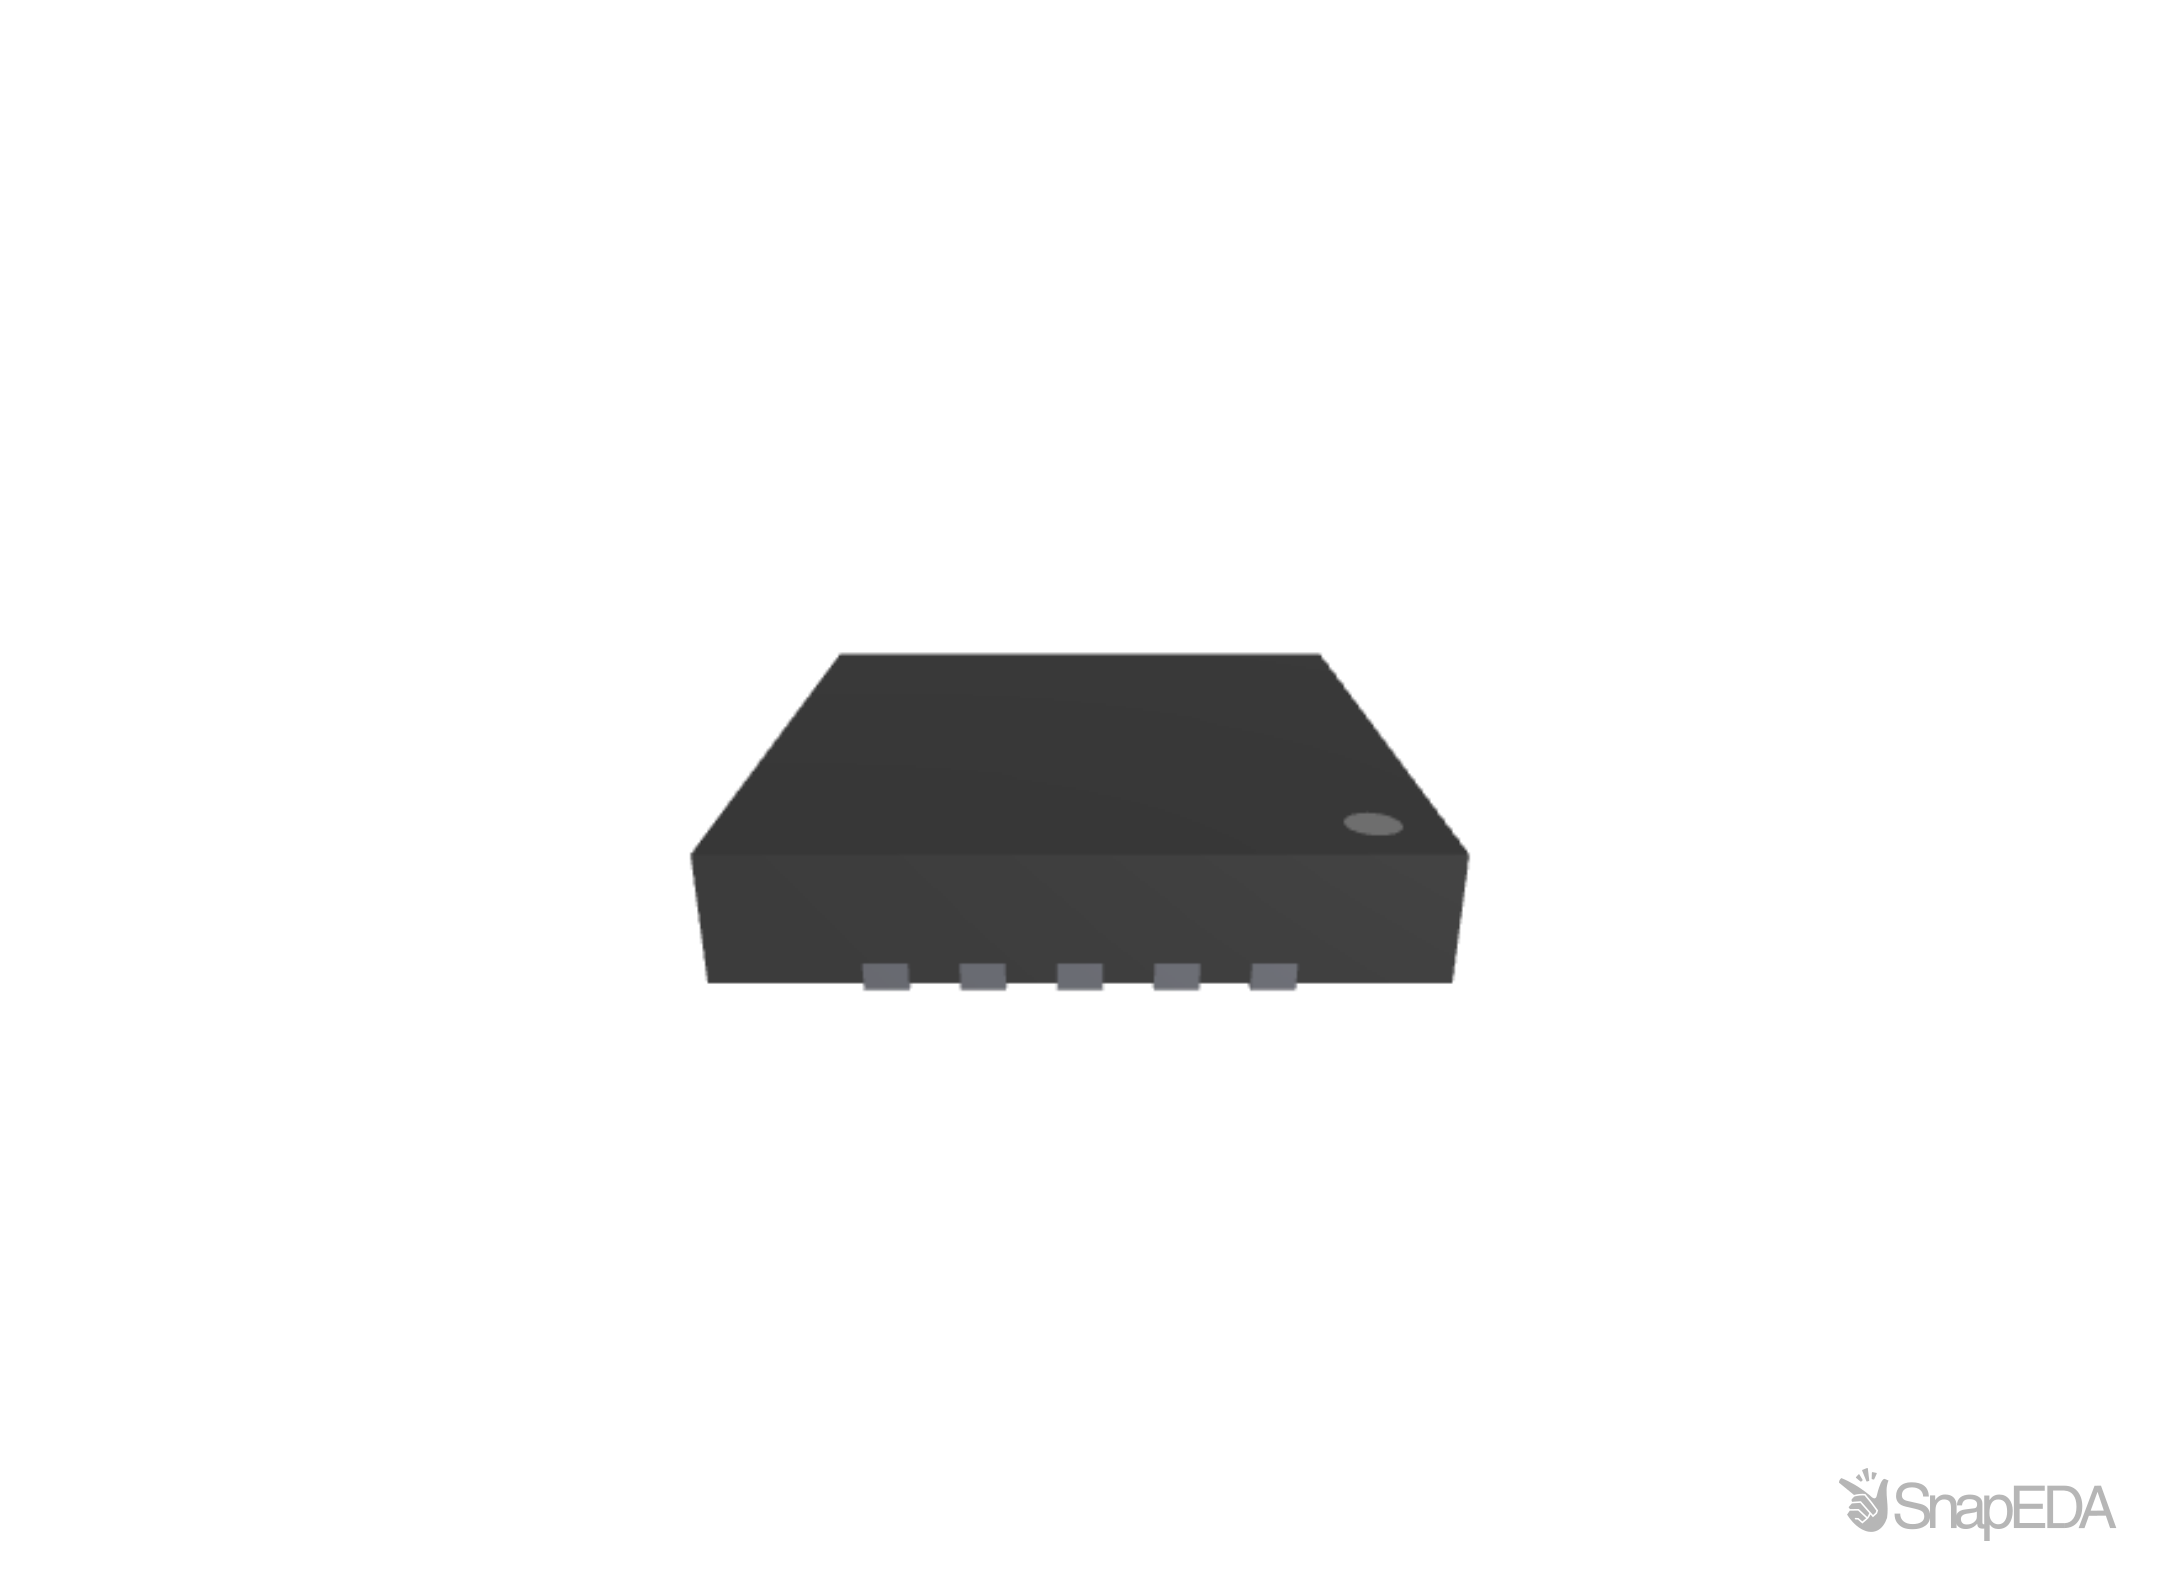 TPS7A4701RGWT 3D Model